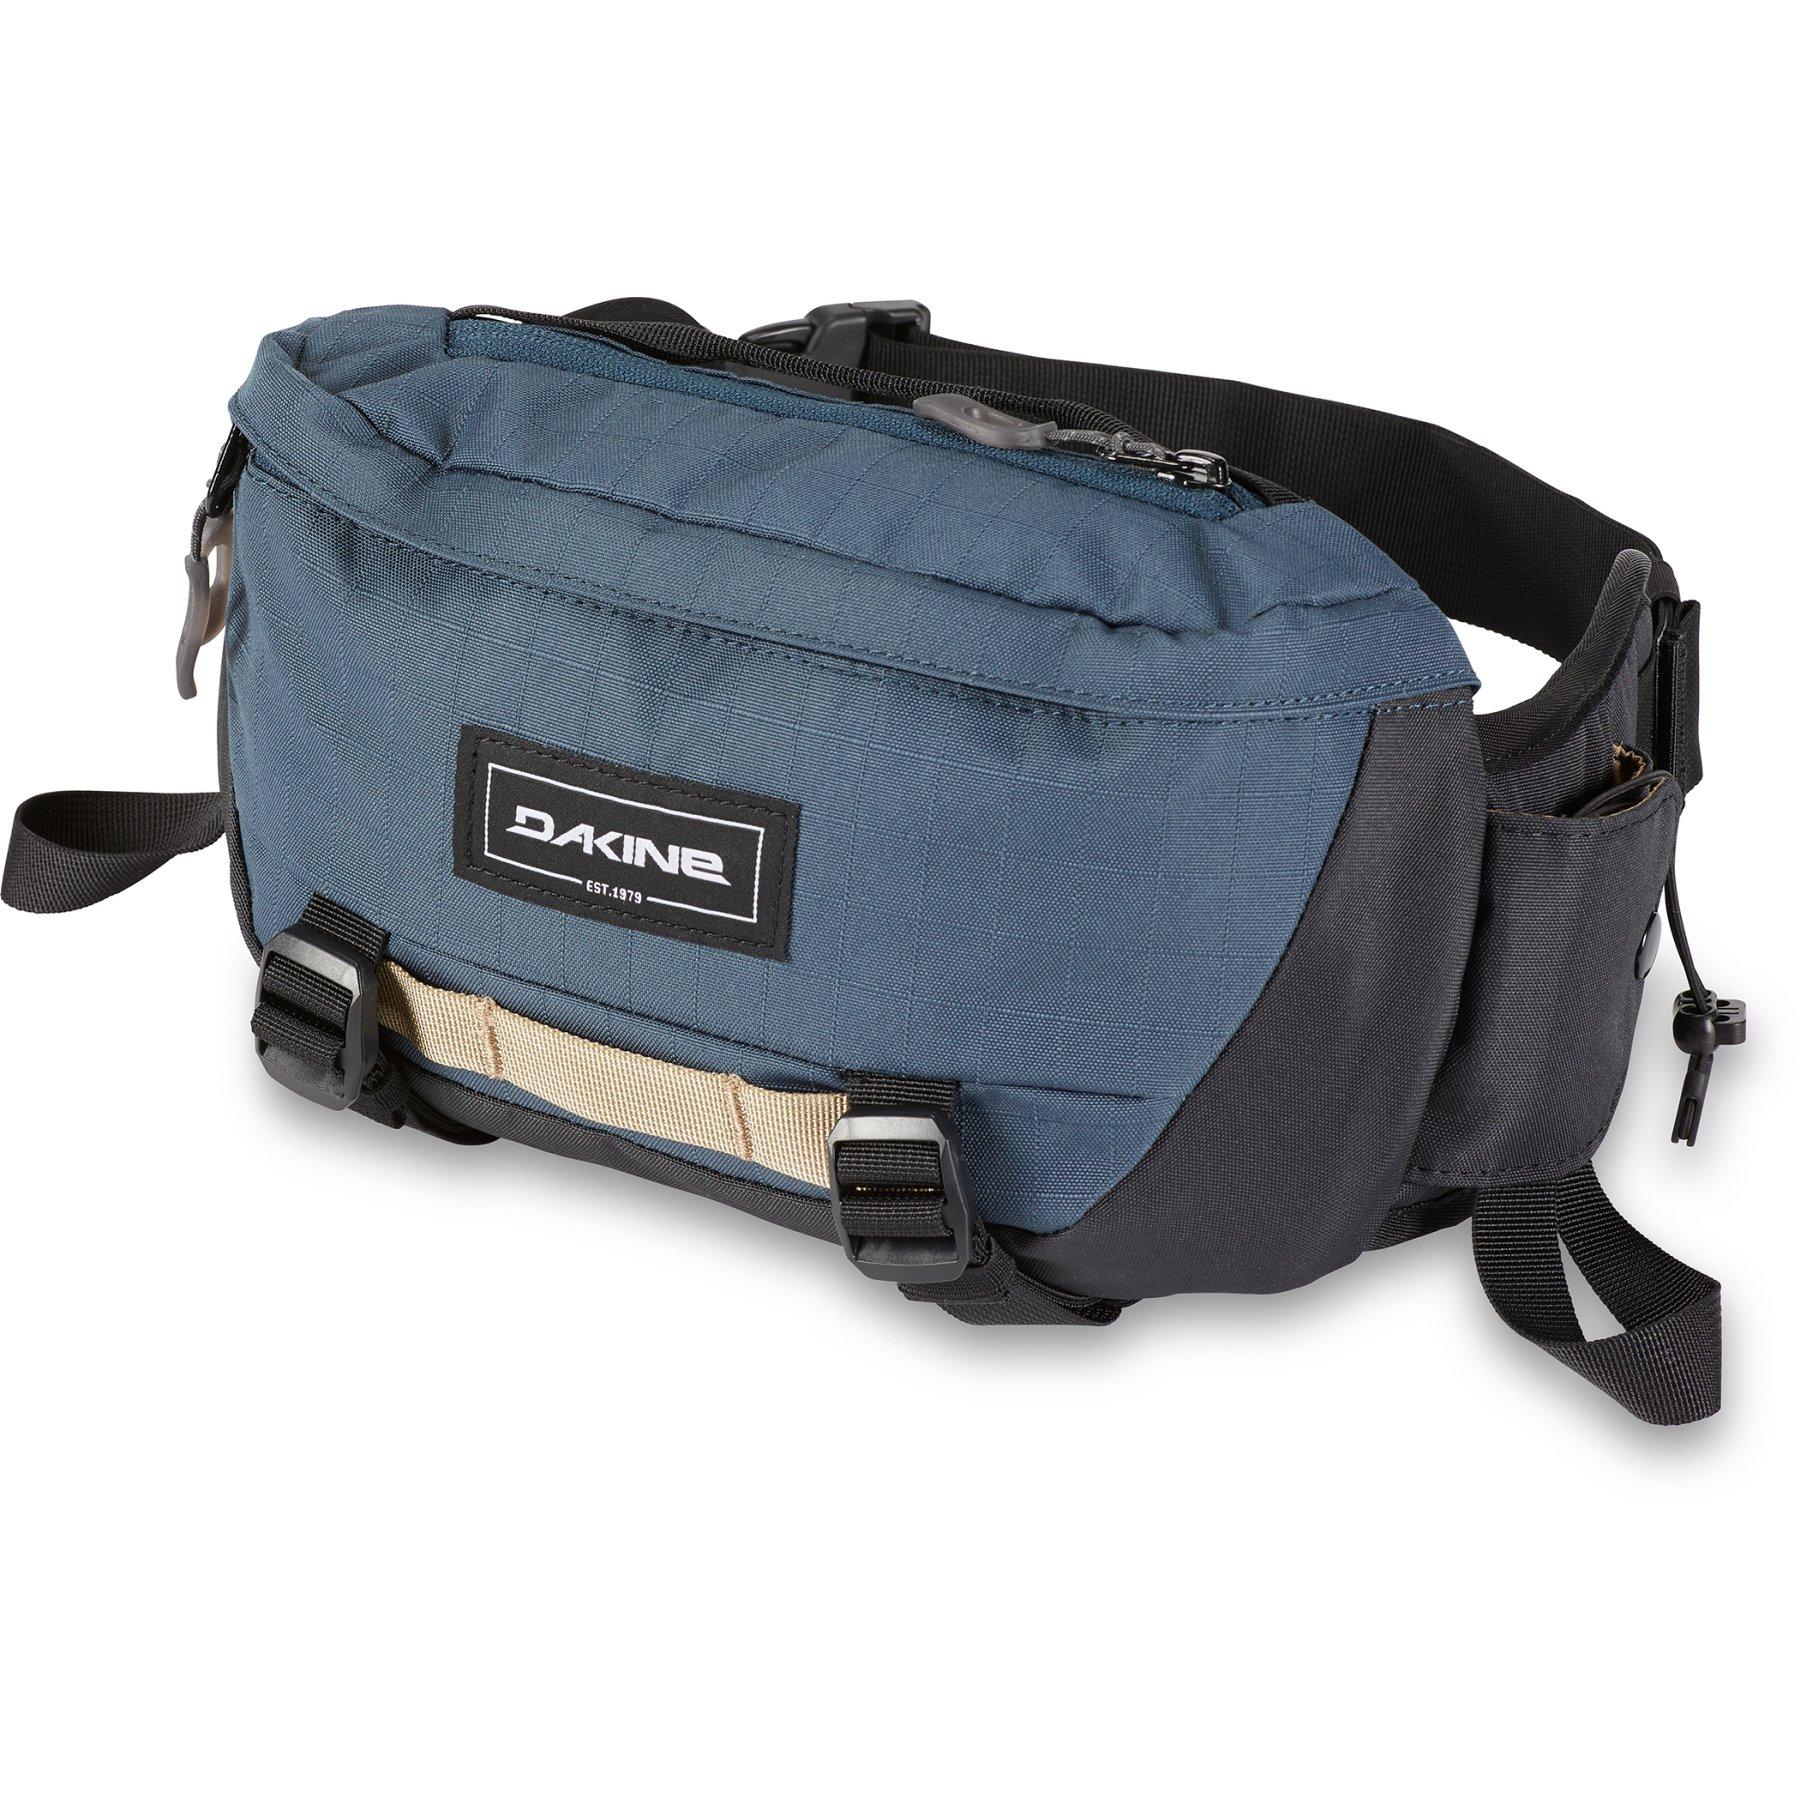 Dakine Hot Laps 2L Bike Waist Bag - midnight blue